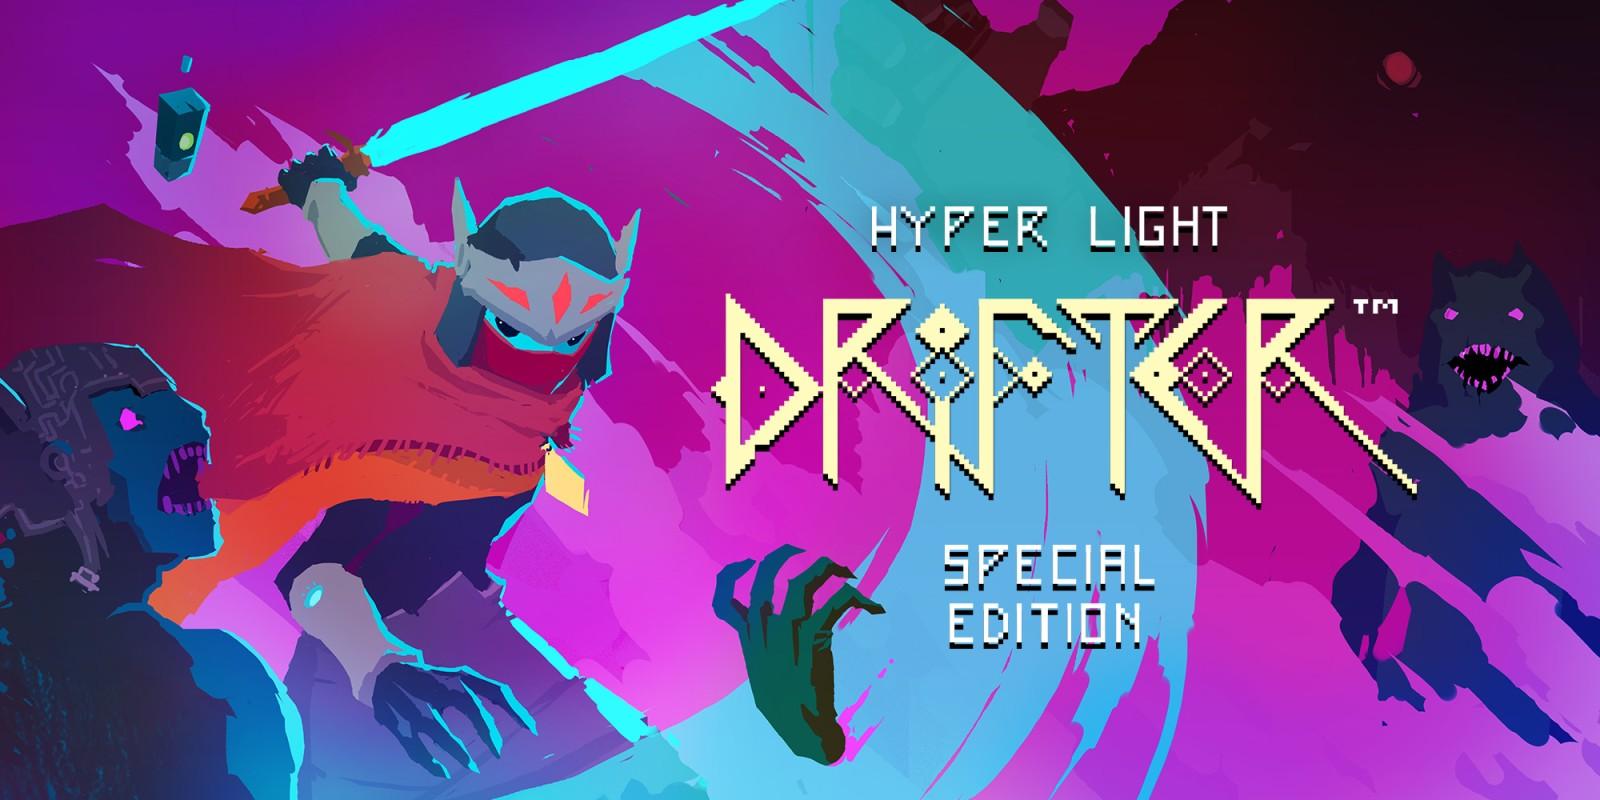 Hyper Light Drifter Special Edition Nintendo Switch Download